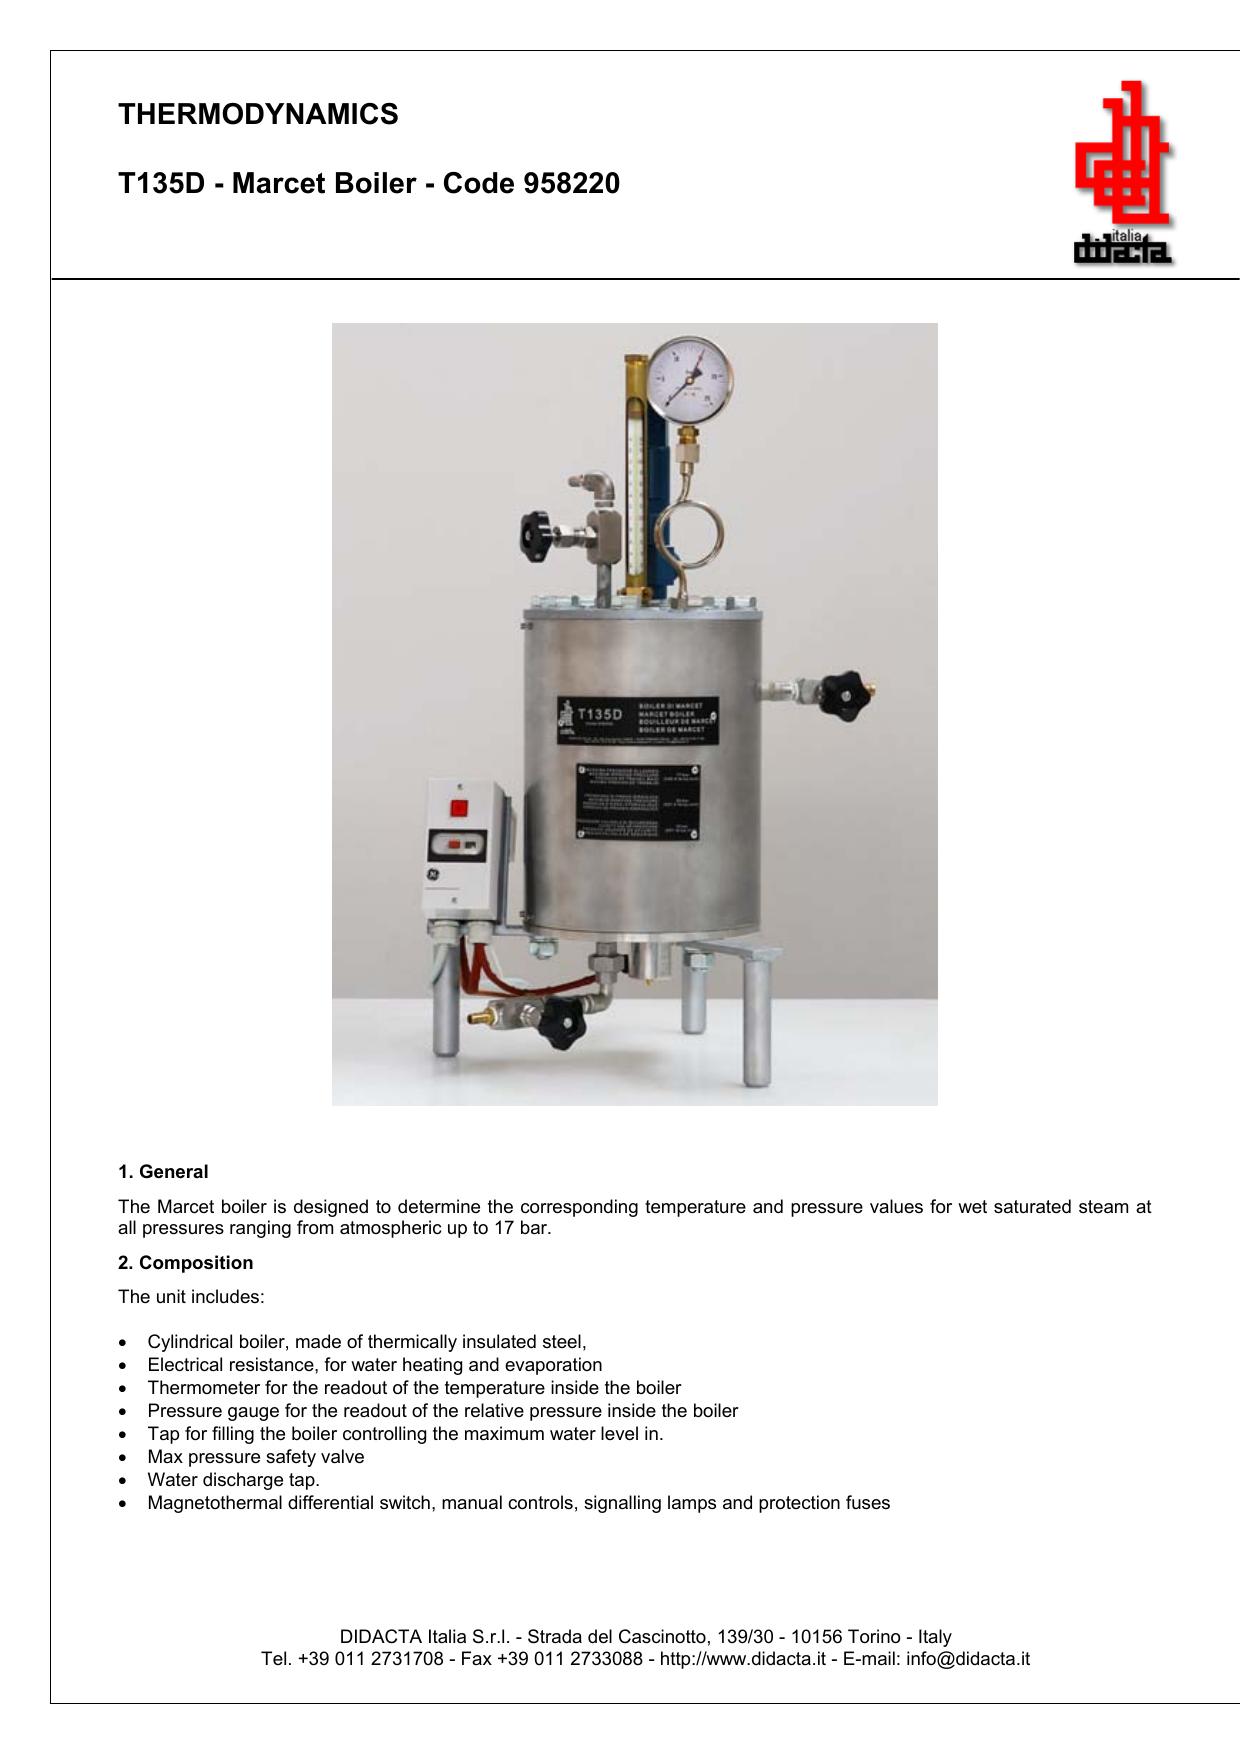 THERMODYNAMICS T135D - Marcet Boiler